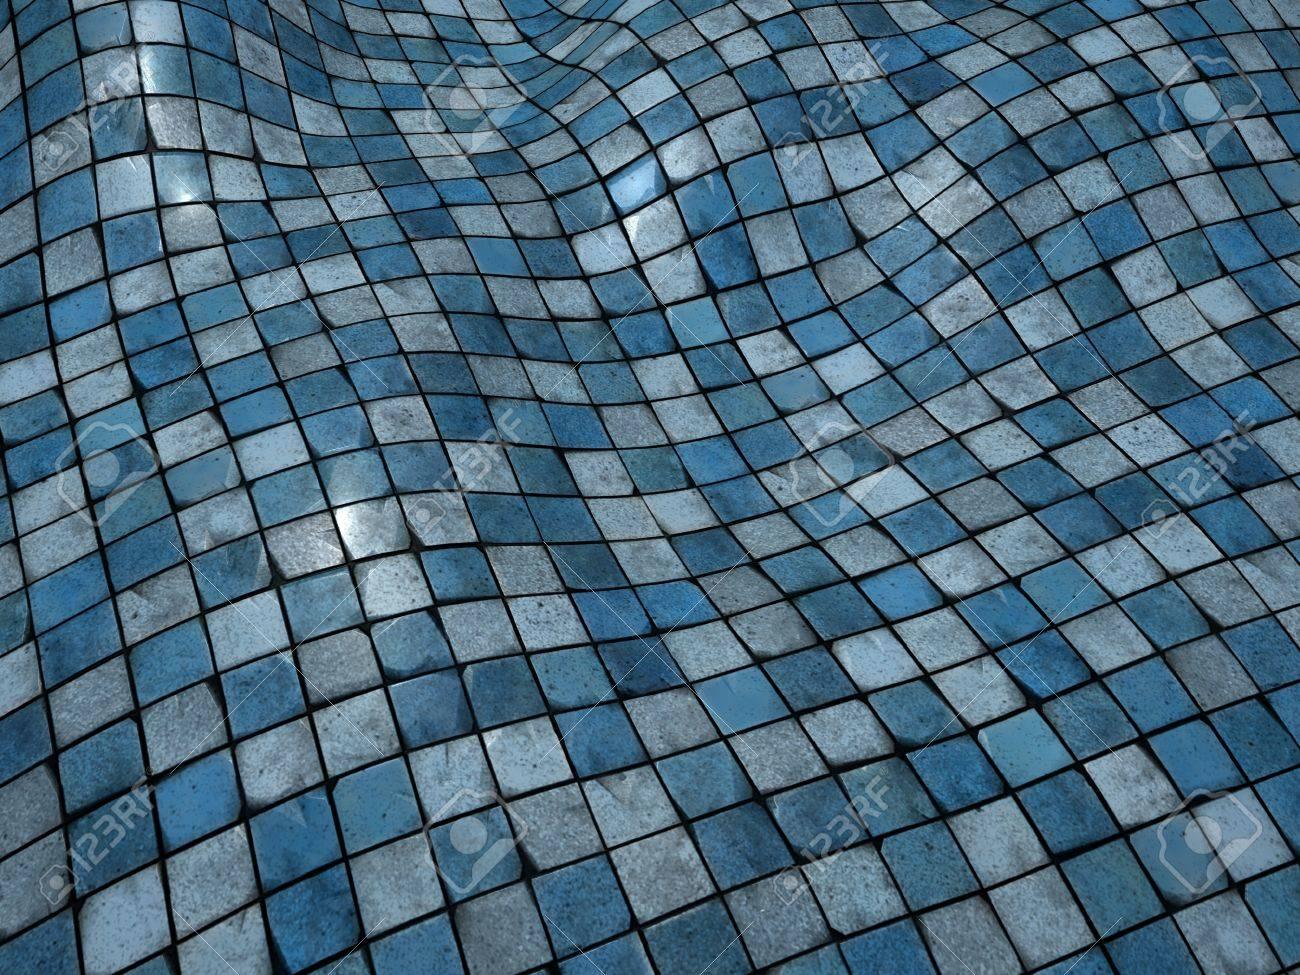 3d Render Blue Wobble Mosaic Tile Floor Wall Surface Stock Photo ...